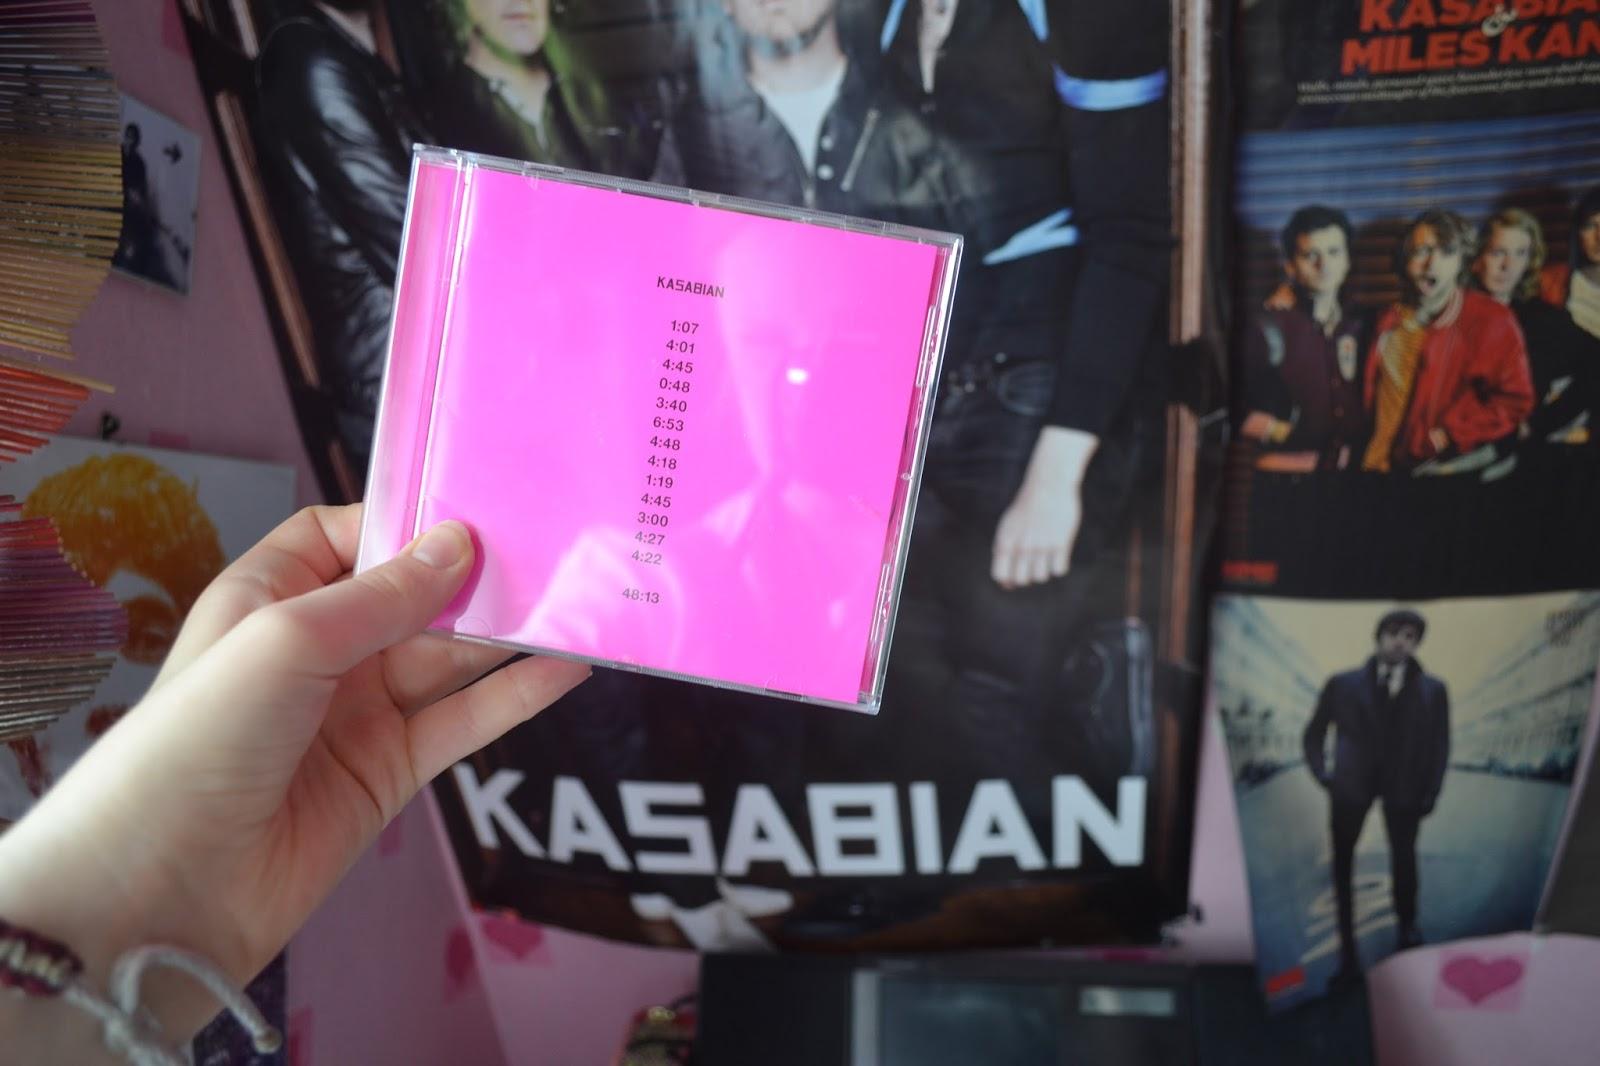 Kasabian 48:13 and Kasabian poster